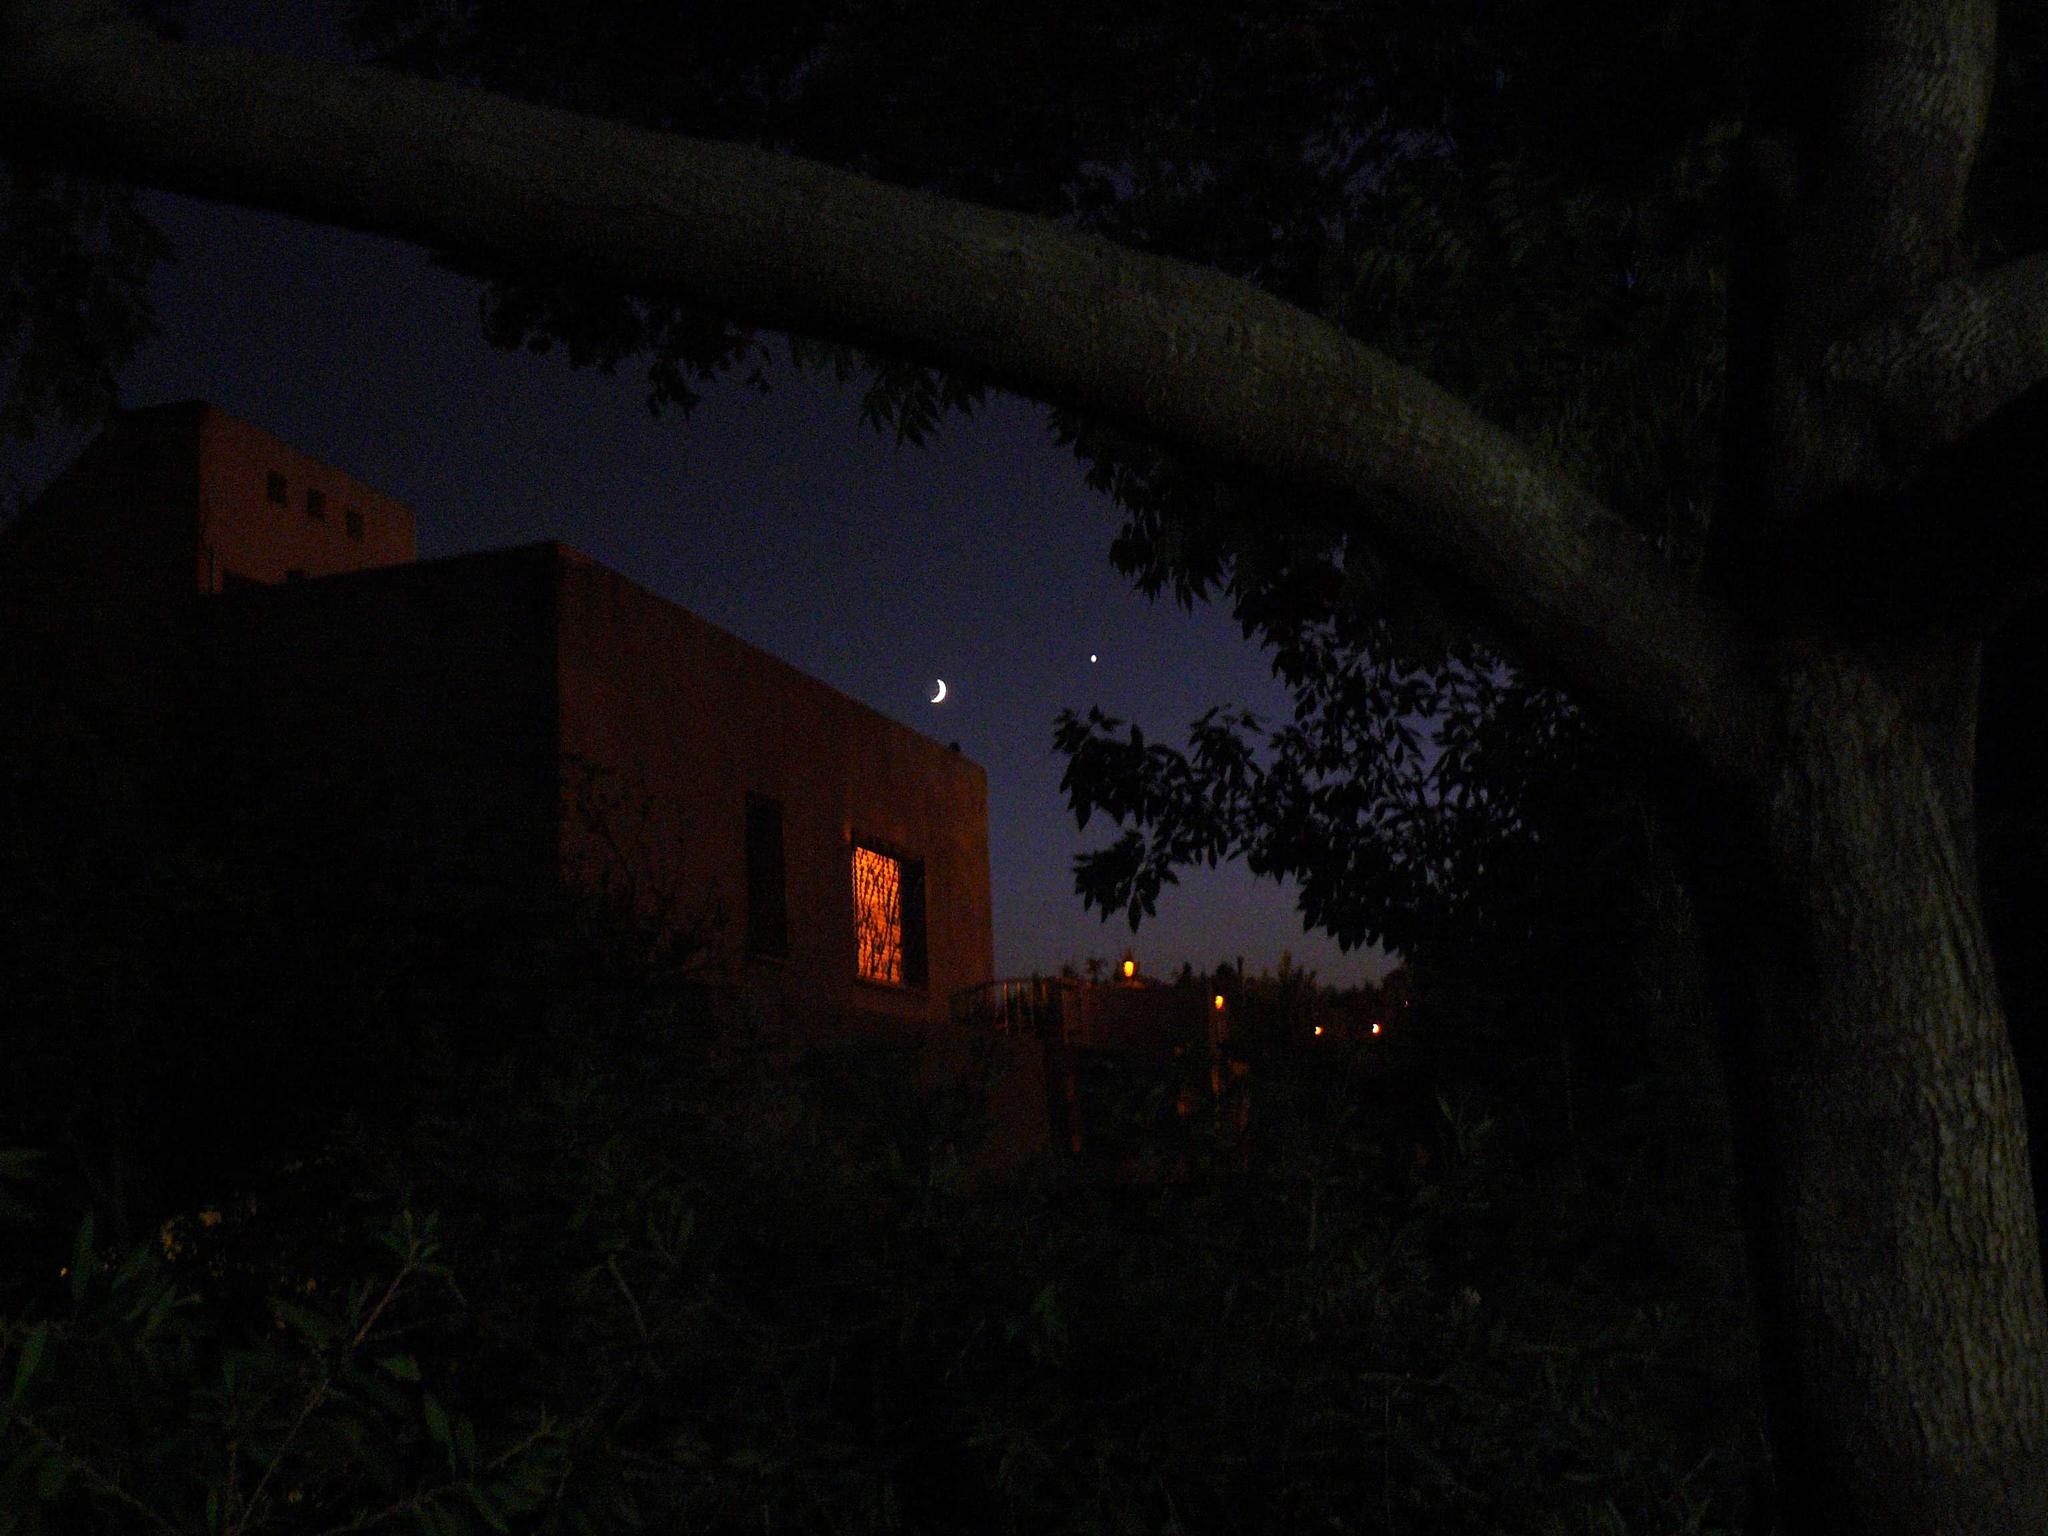 Arabian Night by Dave Davidson